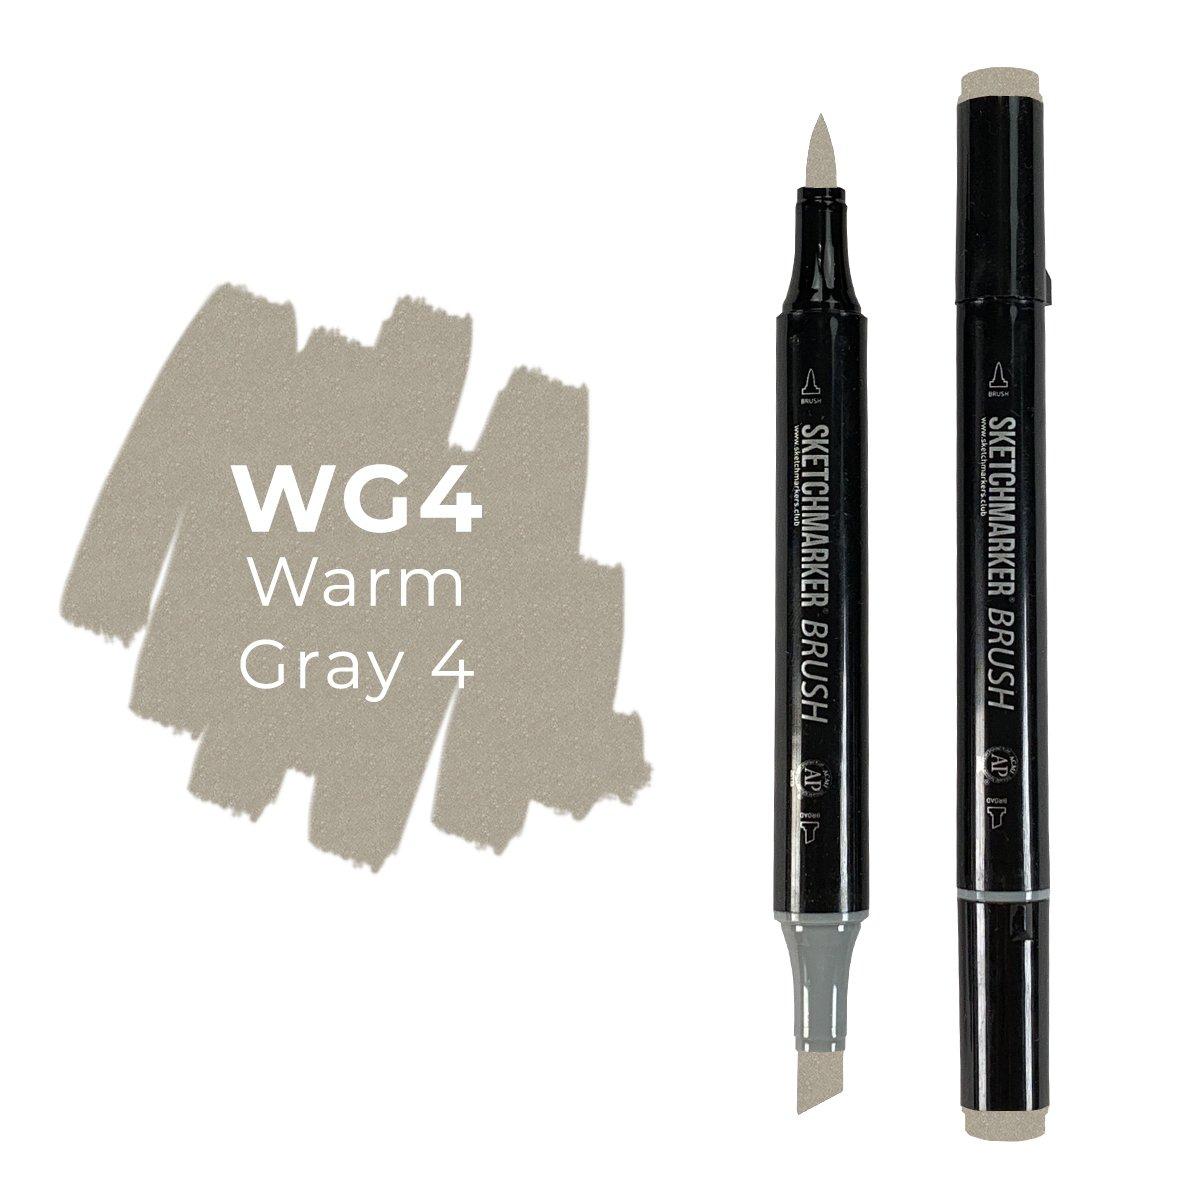 SKETCHMARKER BRUSH PRO Color: Warm Gray 4